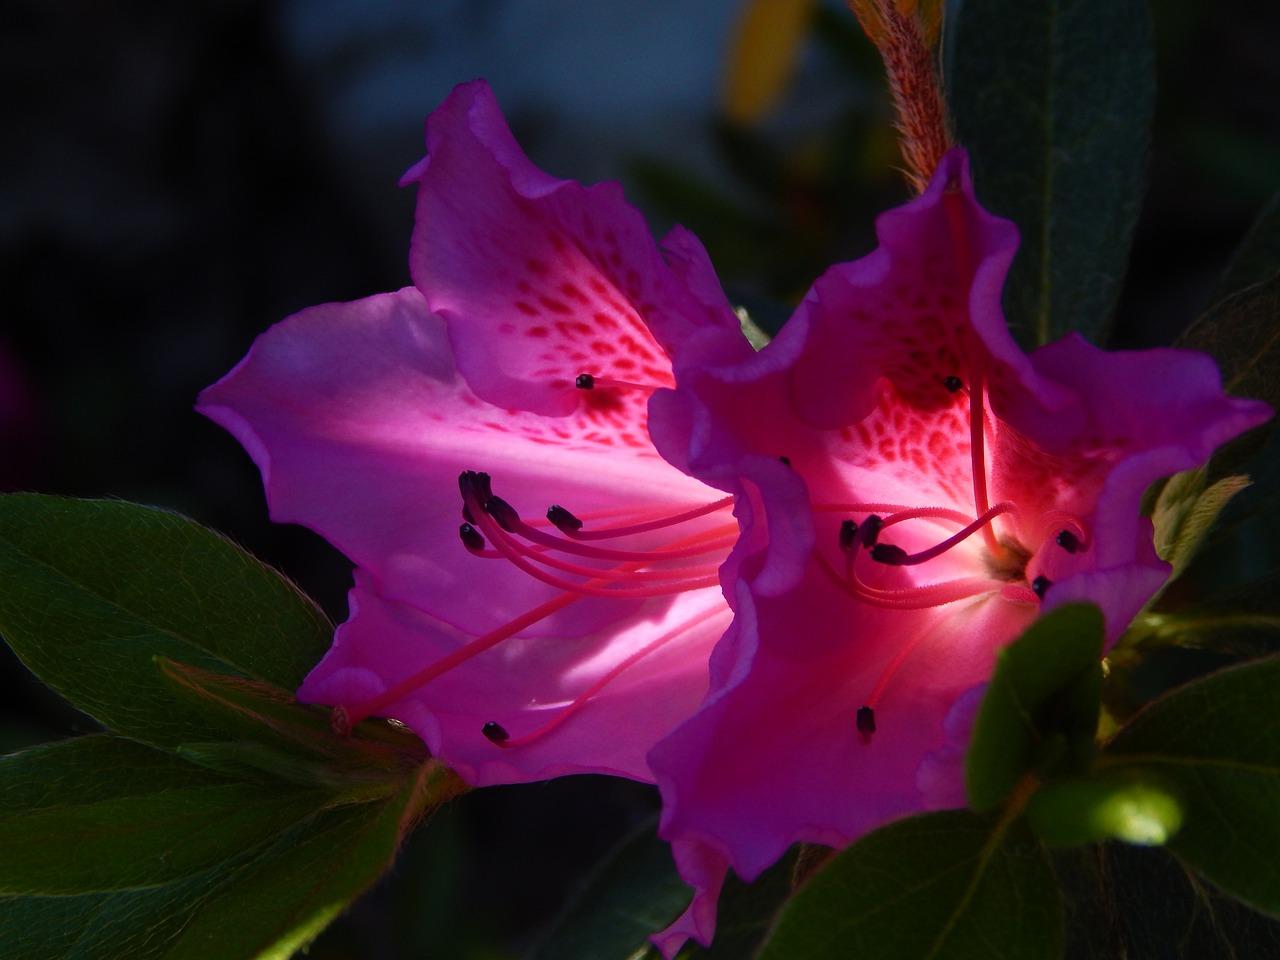 подробности картинки азалии цветка огромную задницу